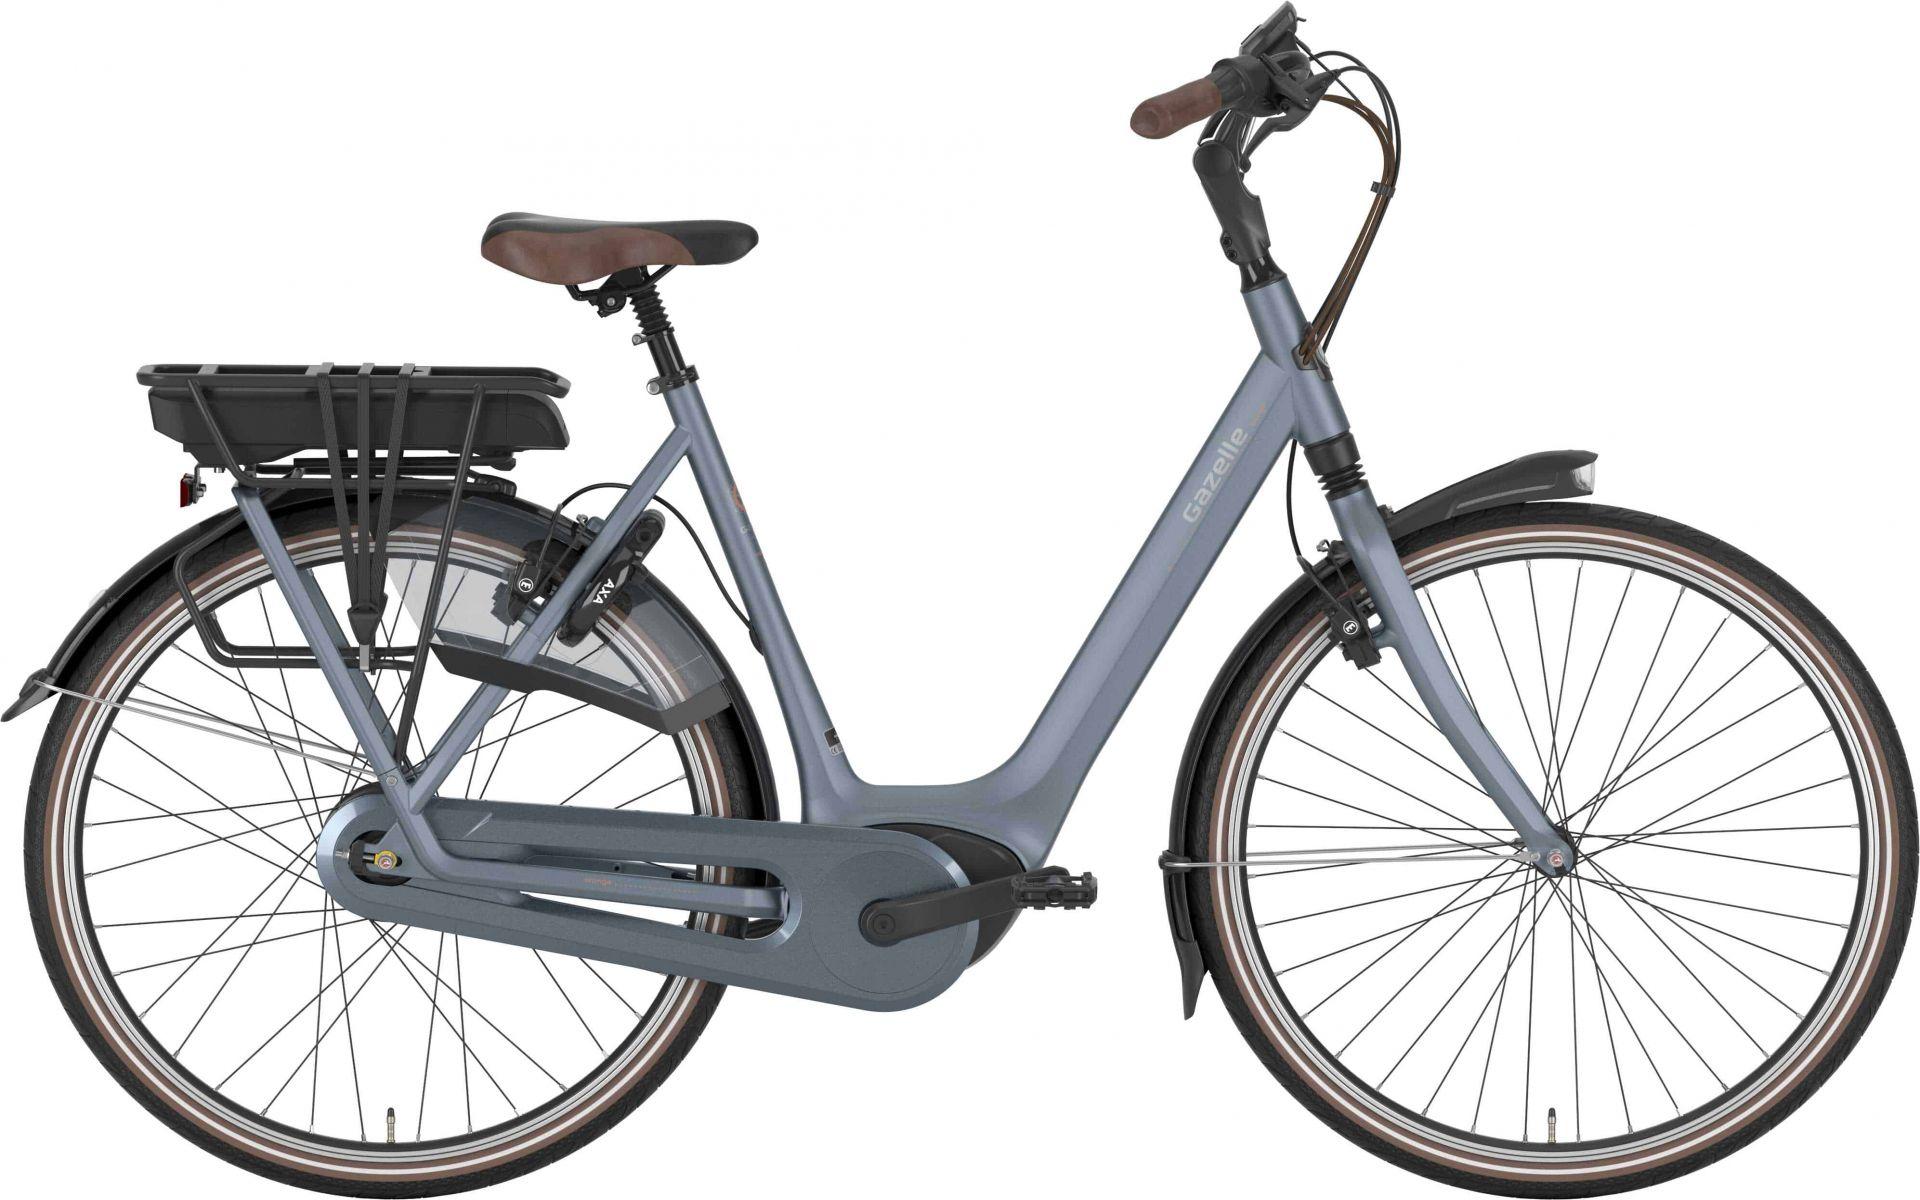 Gazelle Orange C310 Hmb Dame Mirage Blue - 2020 Cykler||Gazelle||Gazelle Elcykler